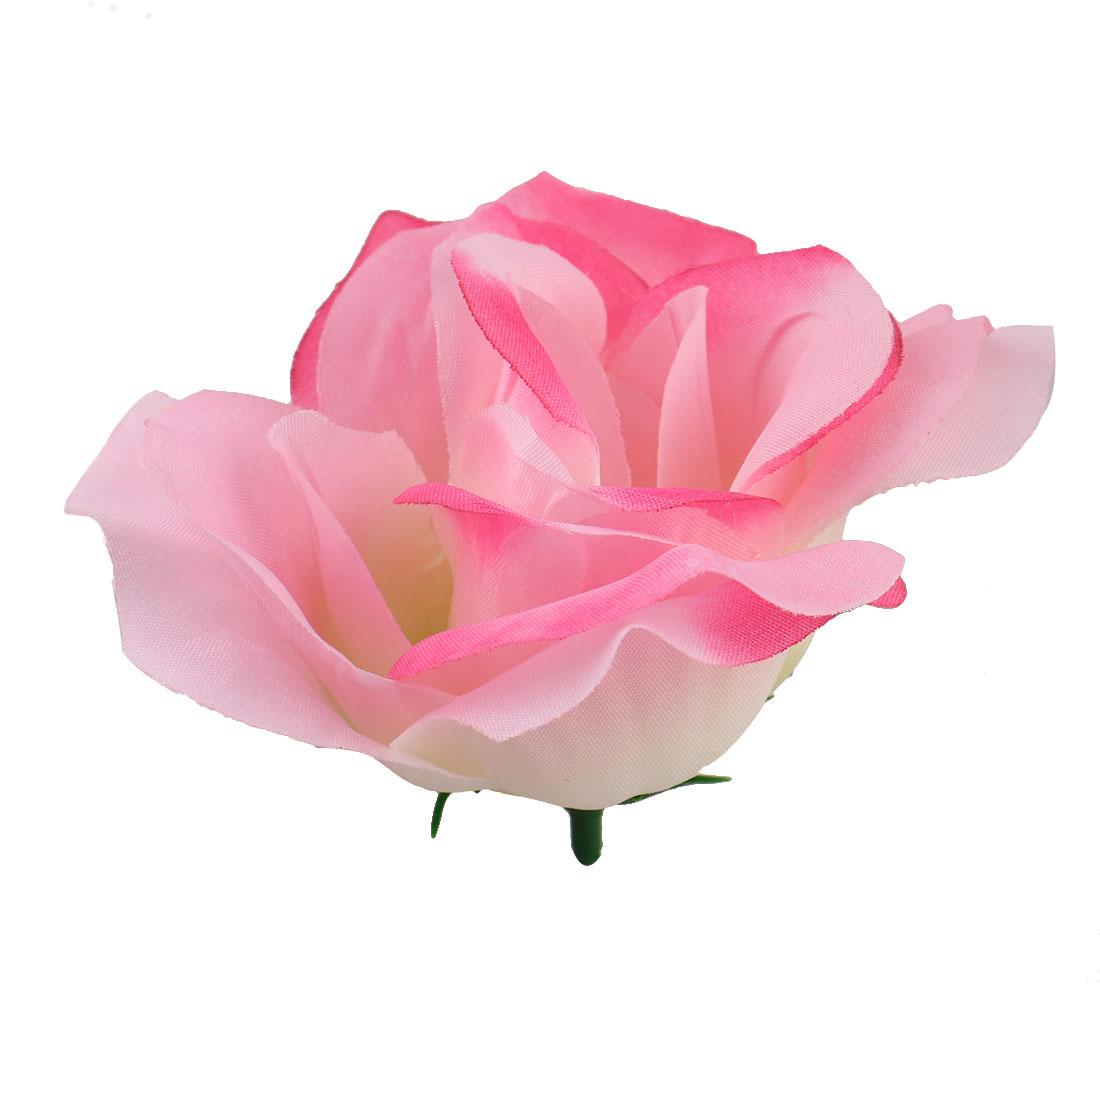 Office Bedroom Table Desk Handcraft Artificial Flower Rose Heads Decoration # 1 - image 4 of 4